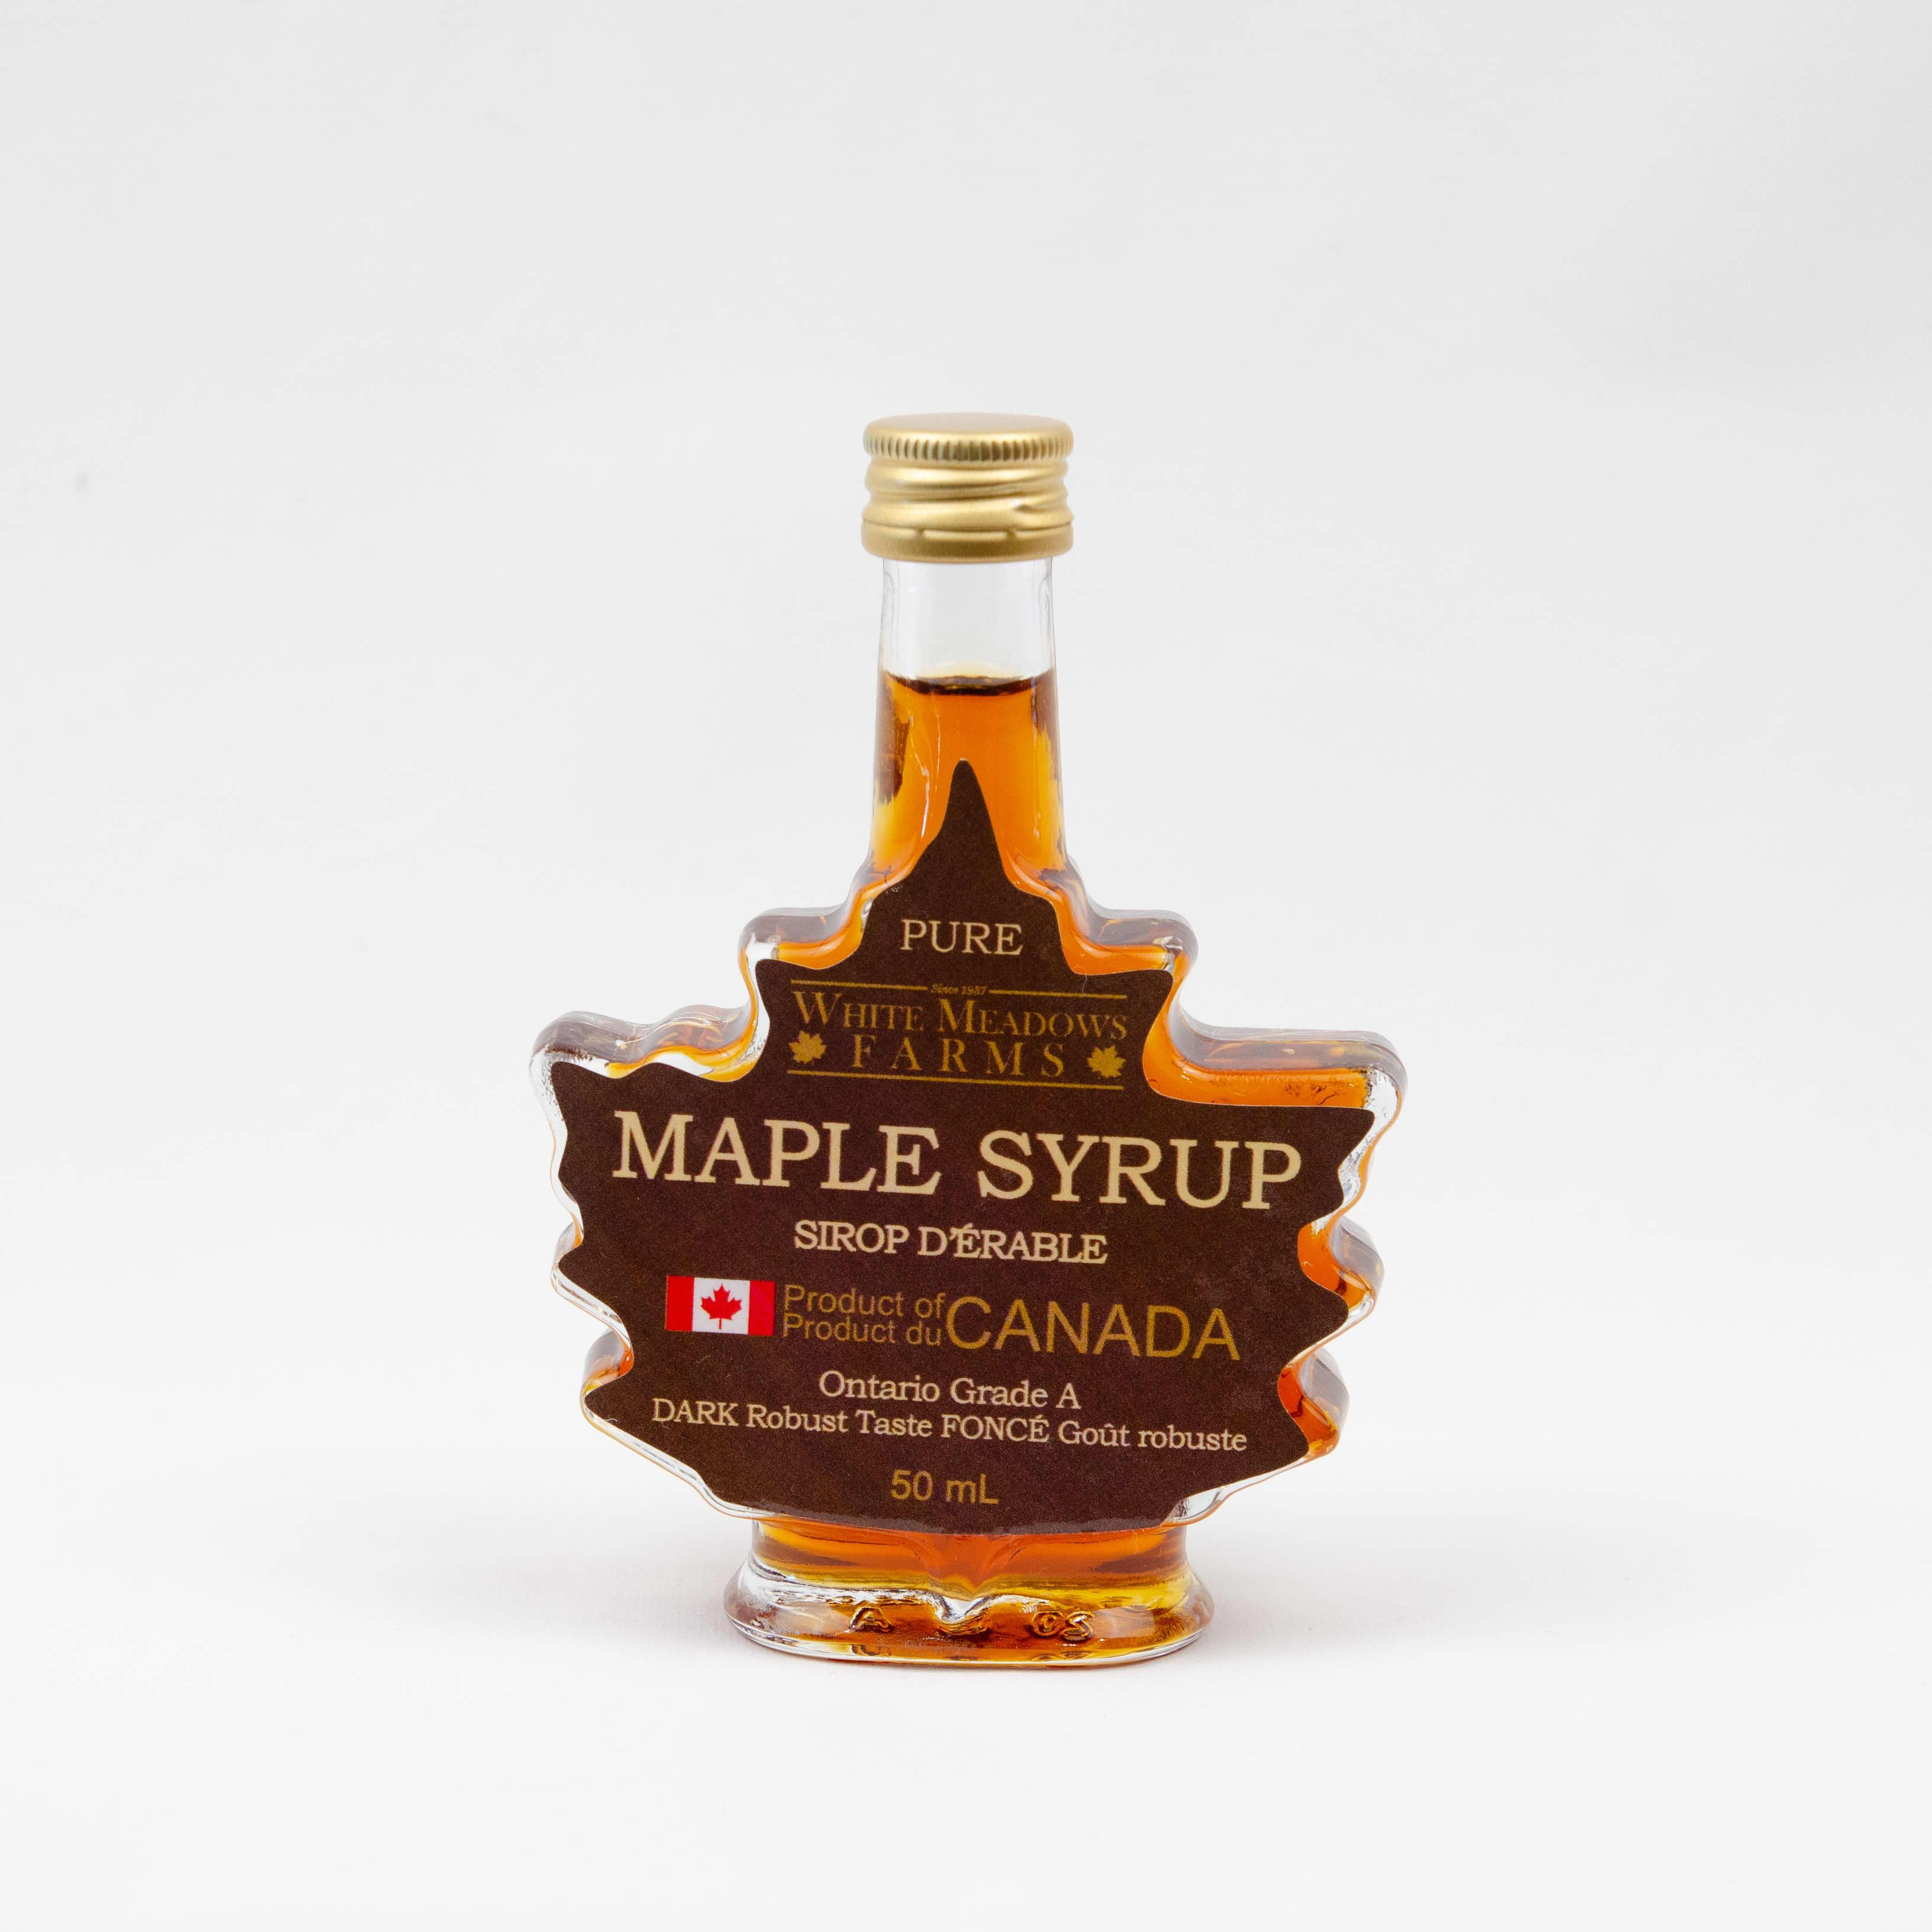 50ml Leaf Maple Syrup White Meadows Farms